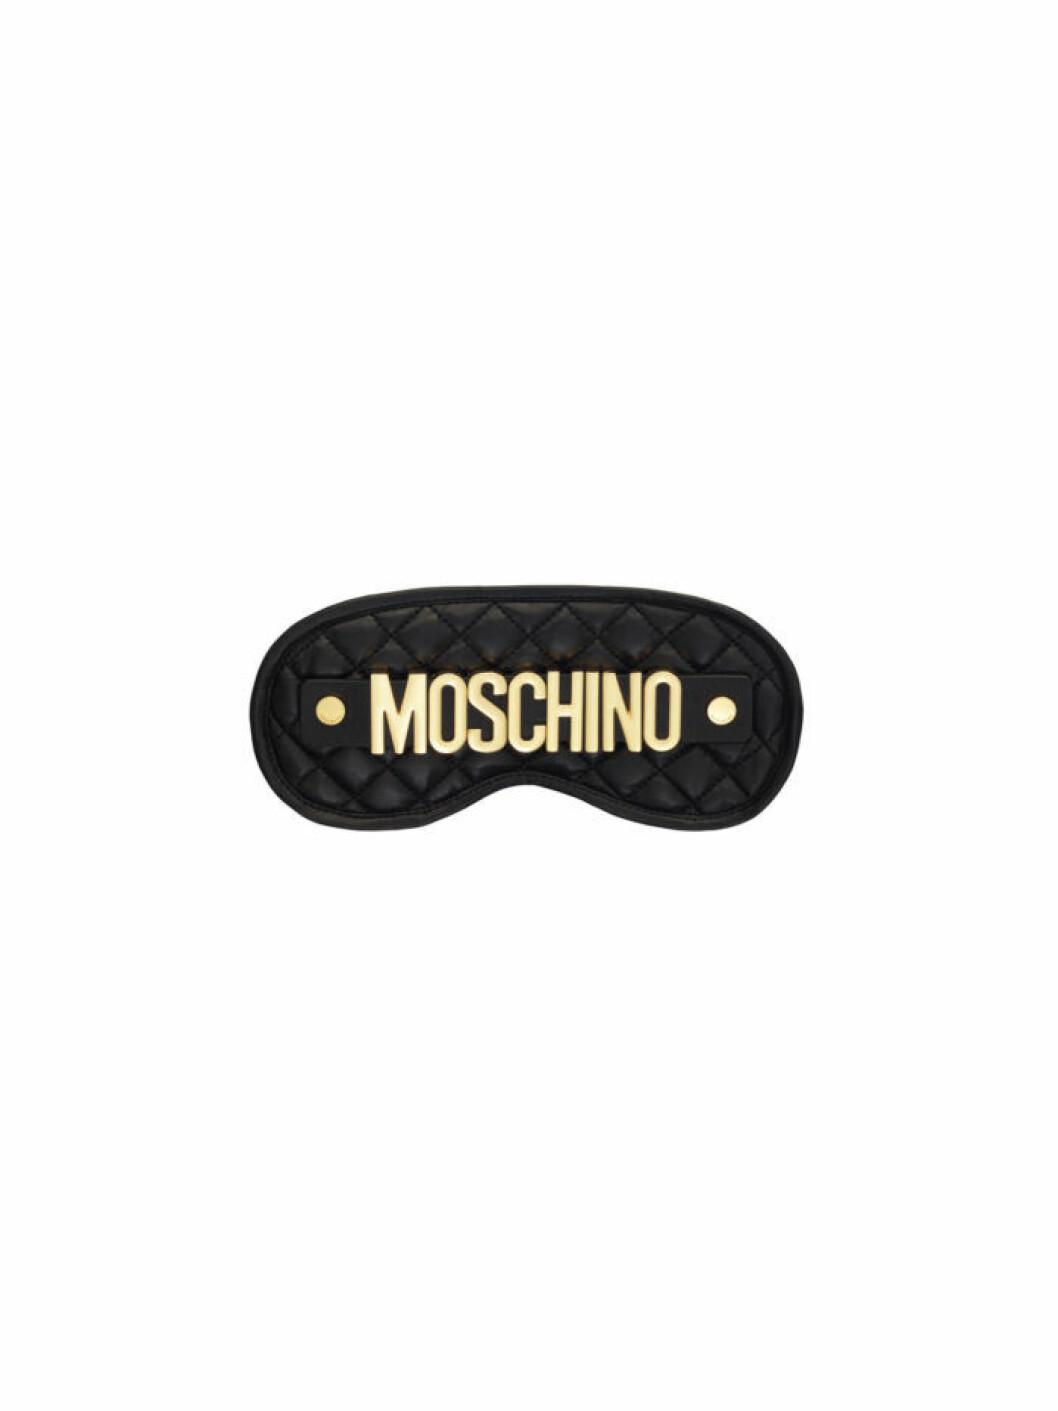 Sovmask med Moschinologo Moschino [tv] H&M